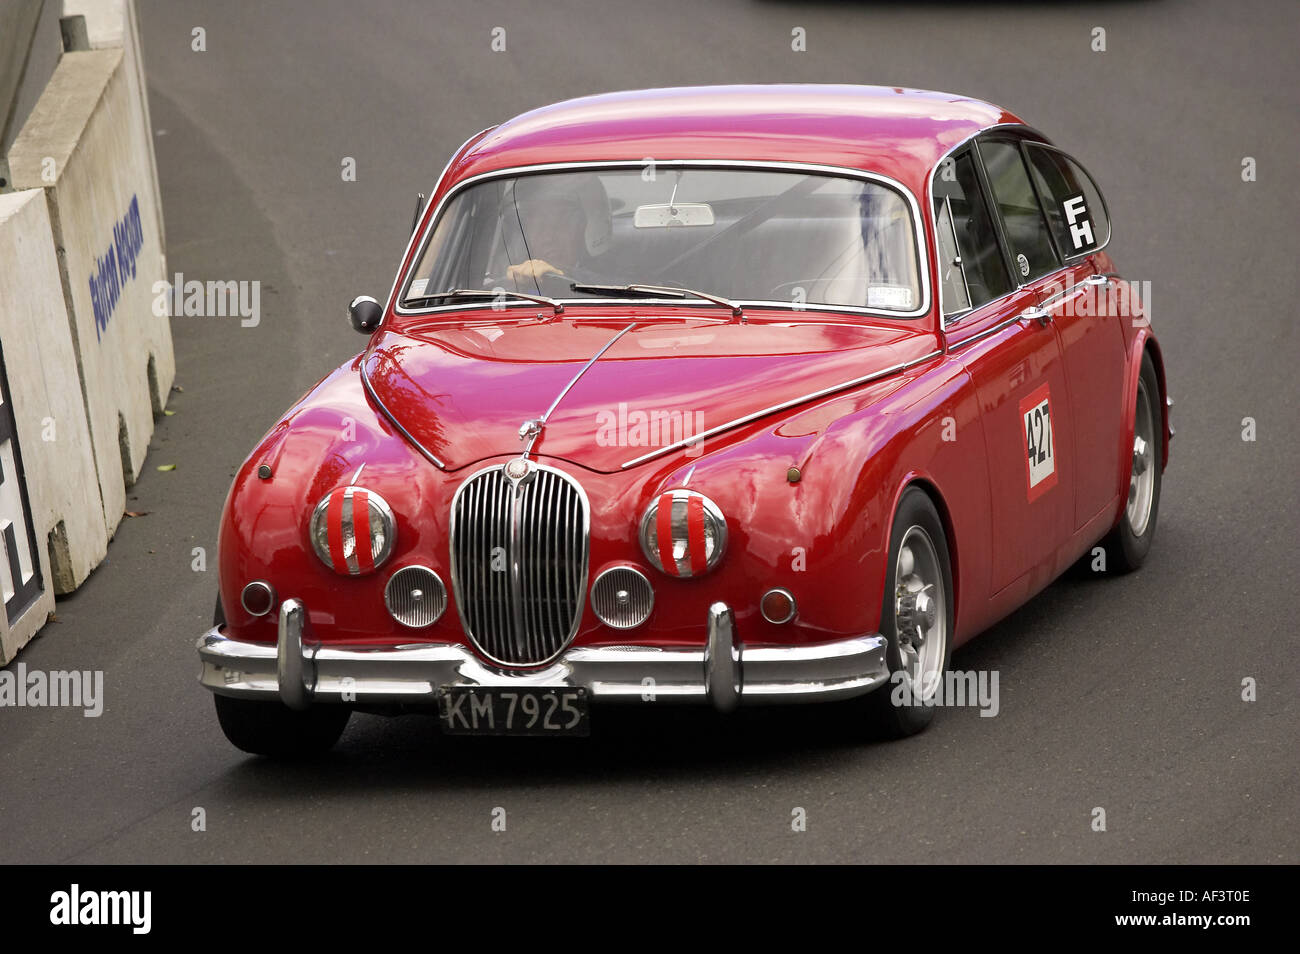 MkII Jaguar Classic Street Racing Dunedin South Island New Zealand - Stock Image